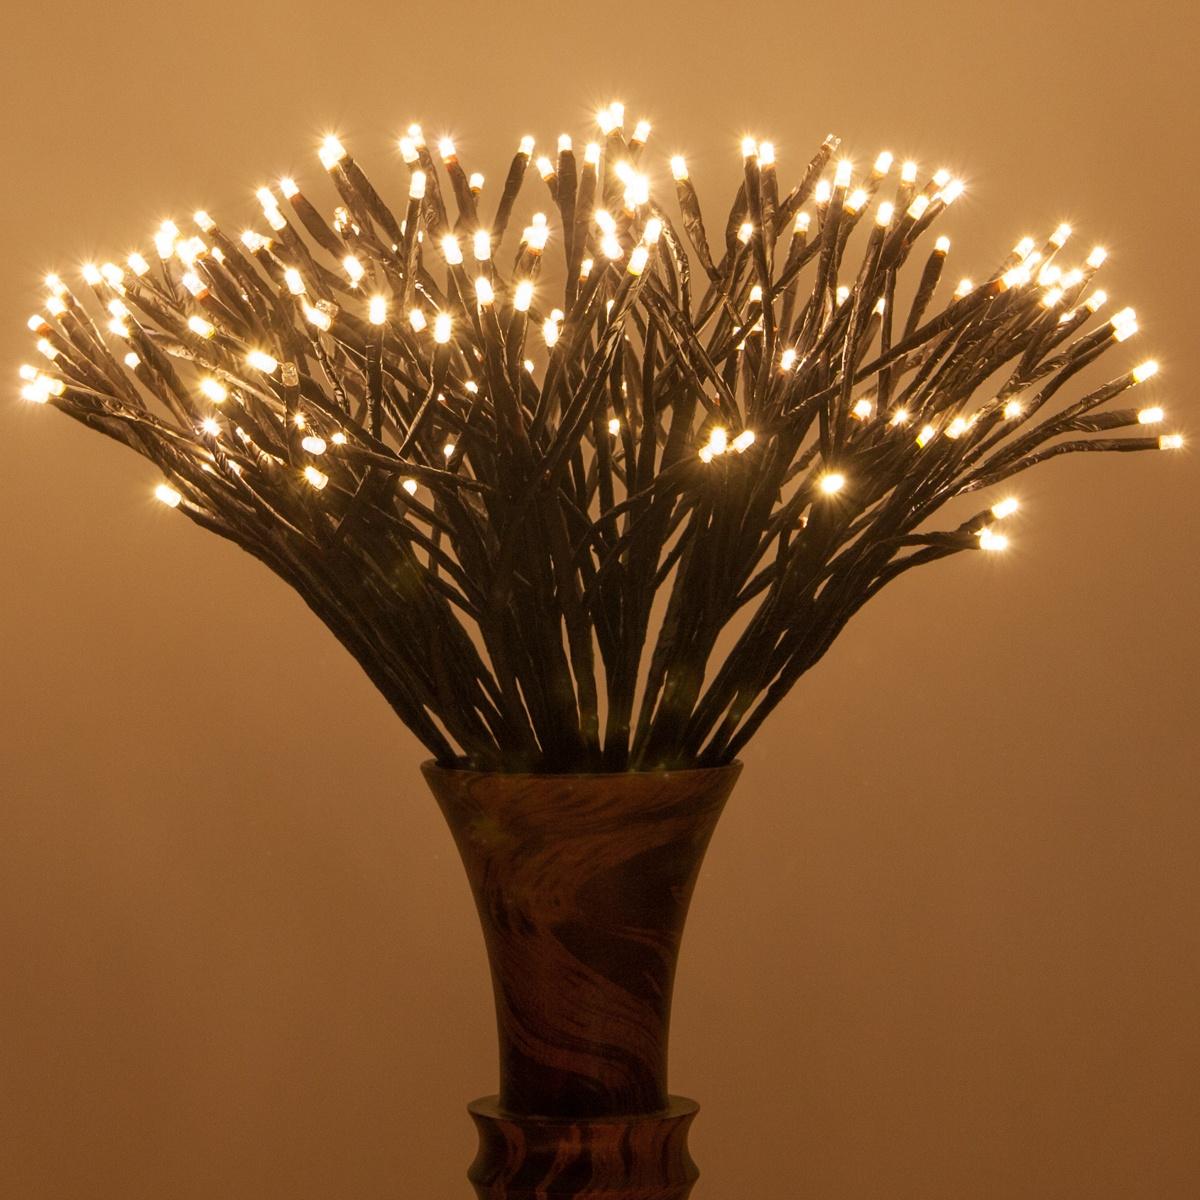 Starburst Branch Lights Vase